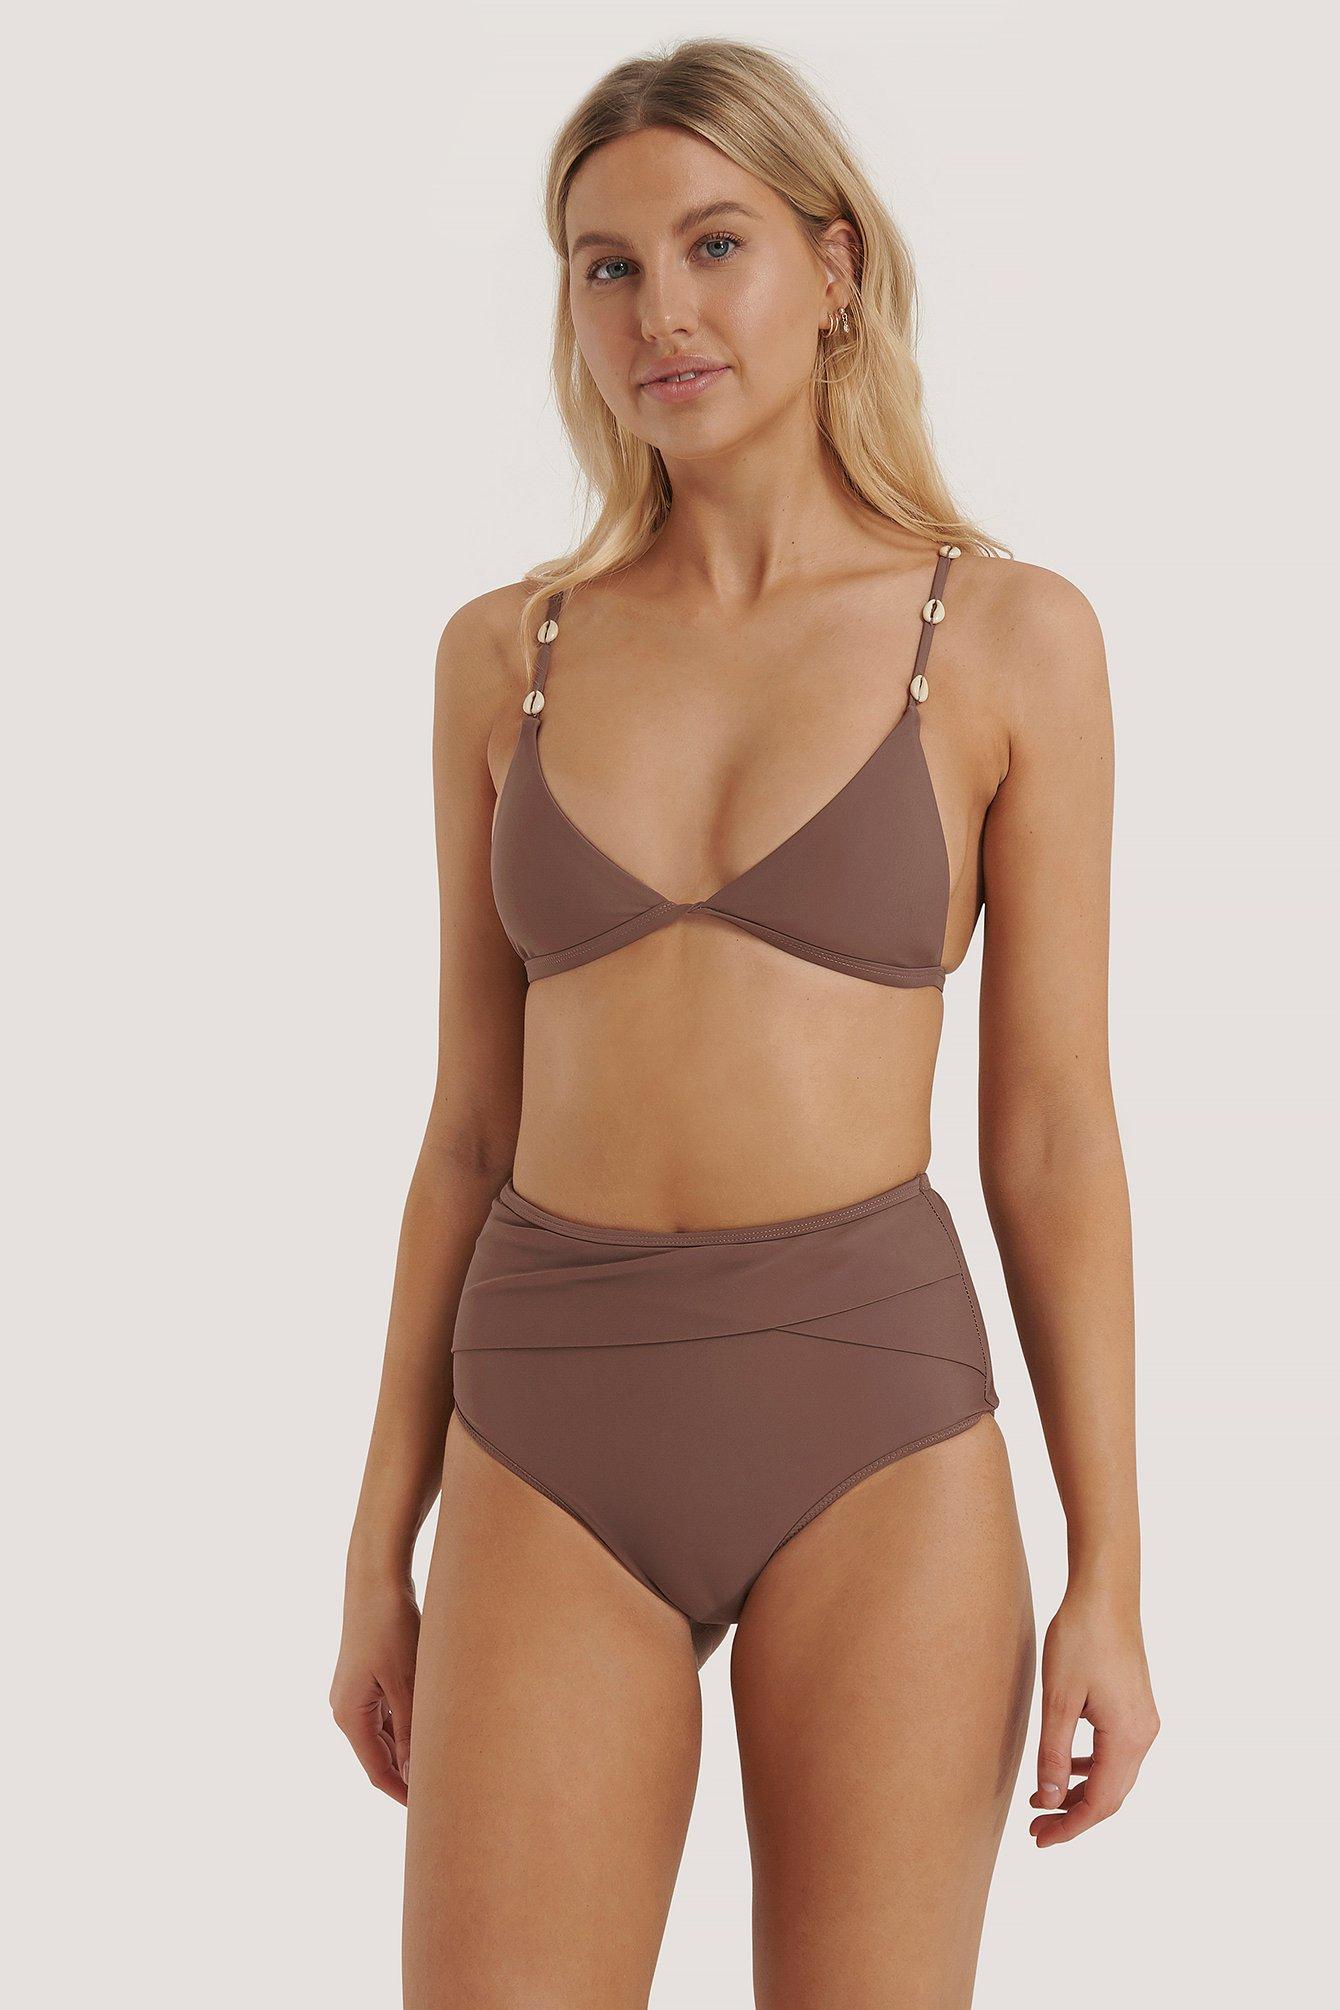 NA-KD Swimwear Bikini-Höschen Mit Hoher Taille - Purple | Bekleidung > Bademode > Bikinis | NA-KD Swimwear